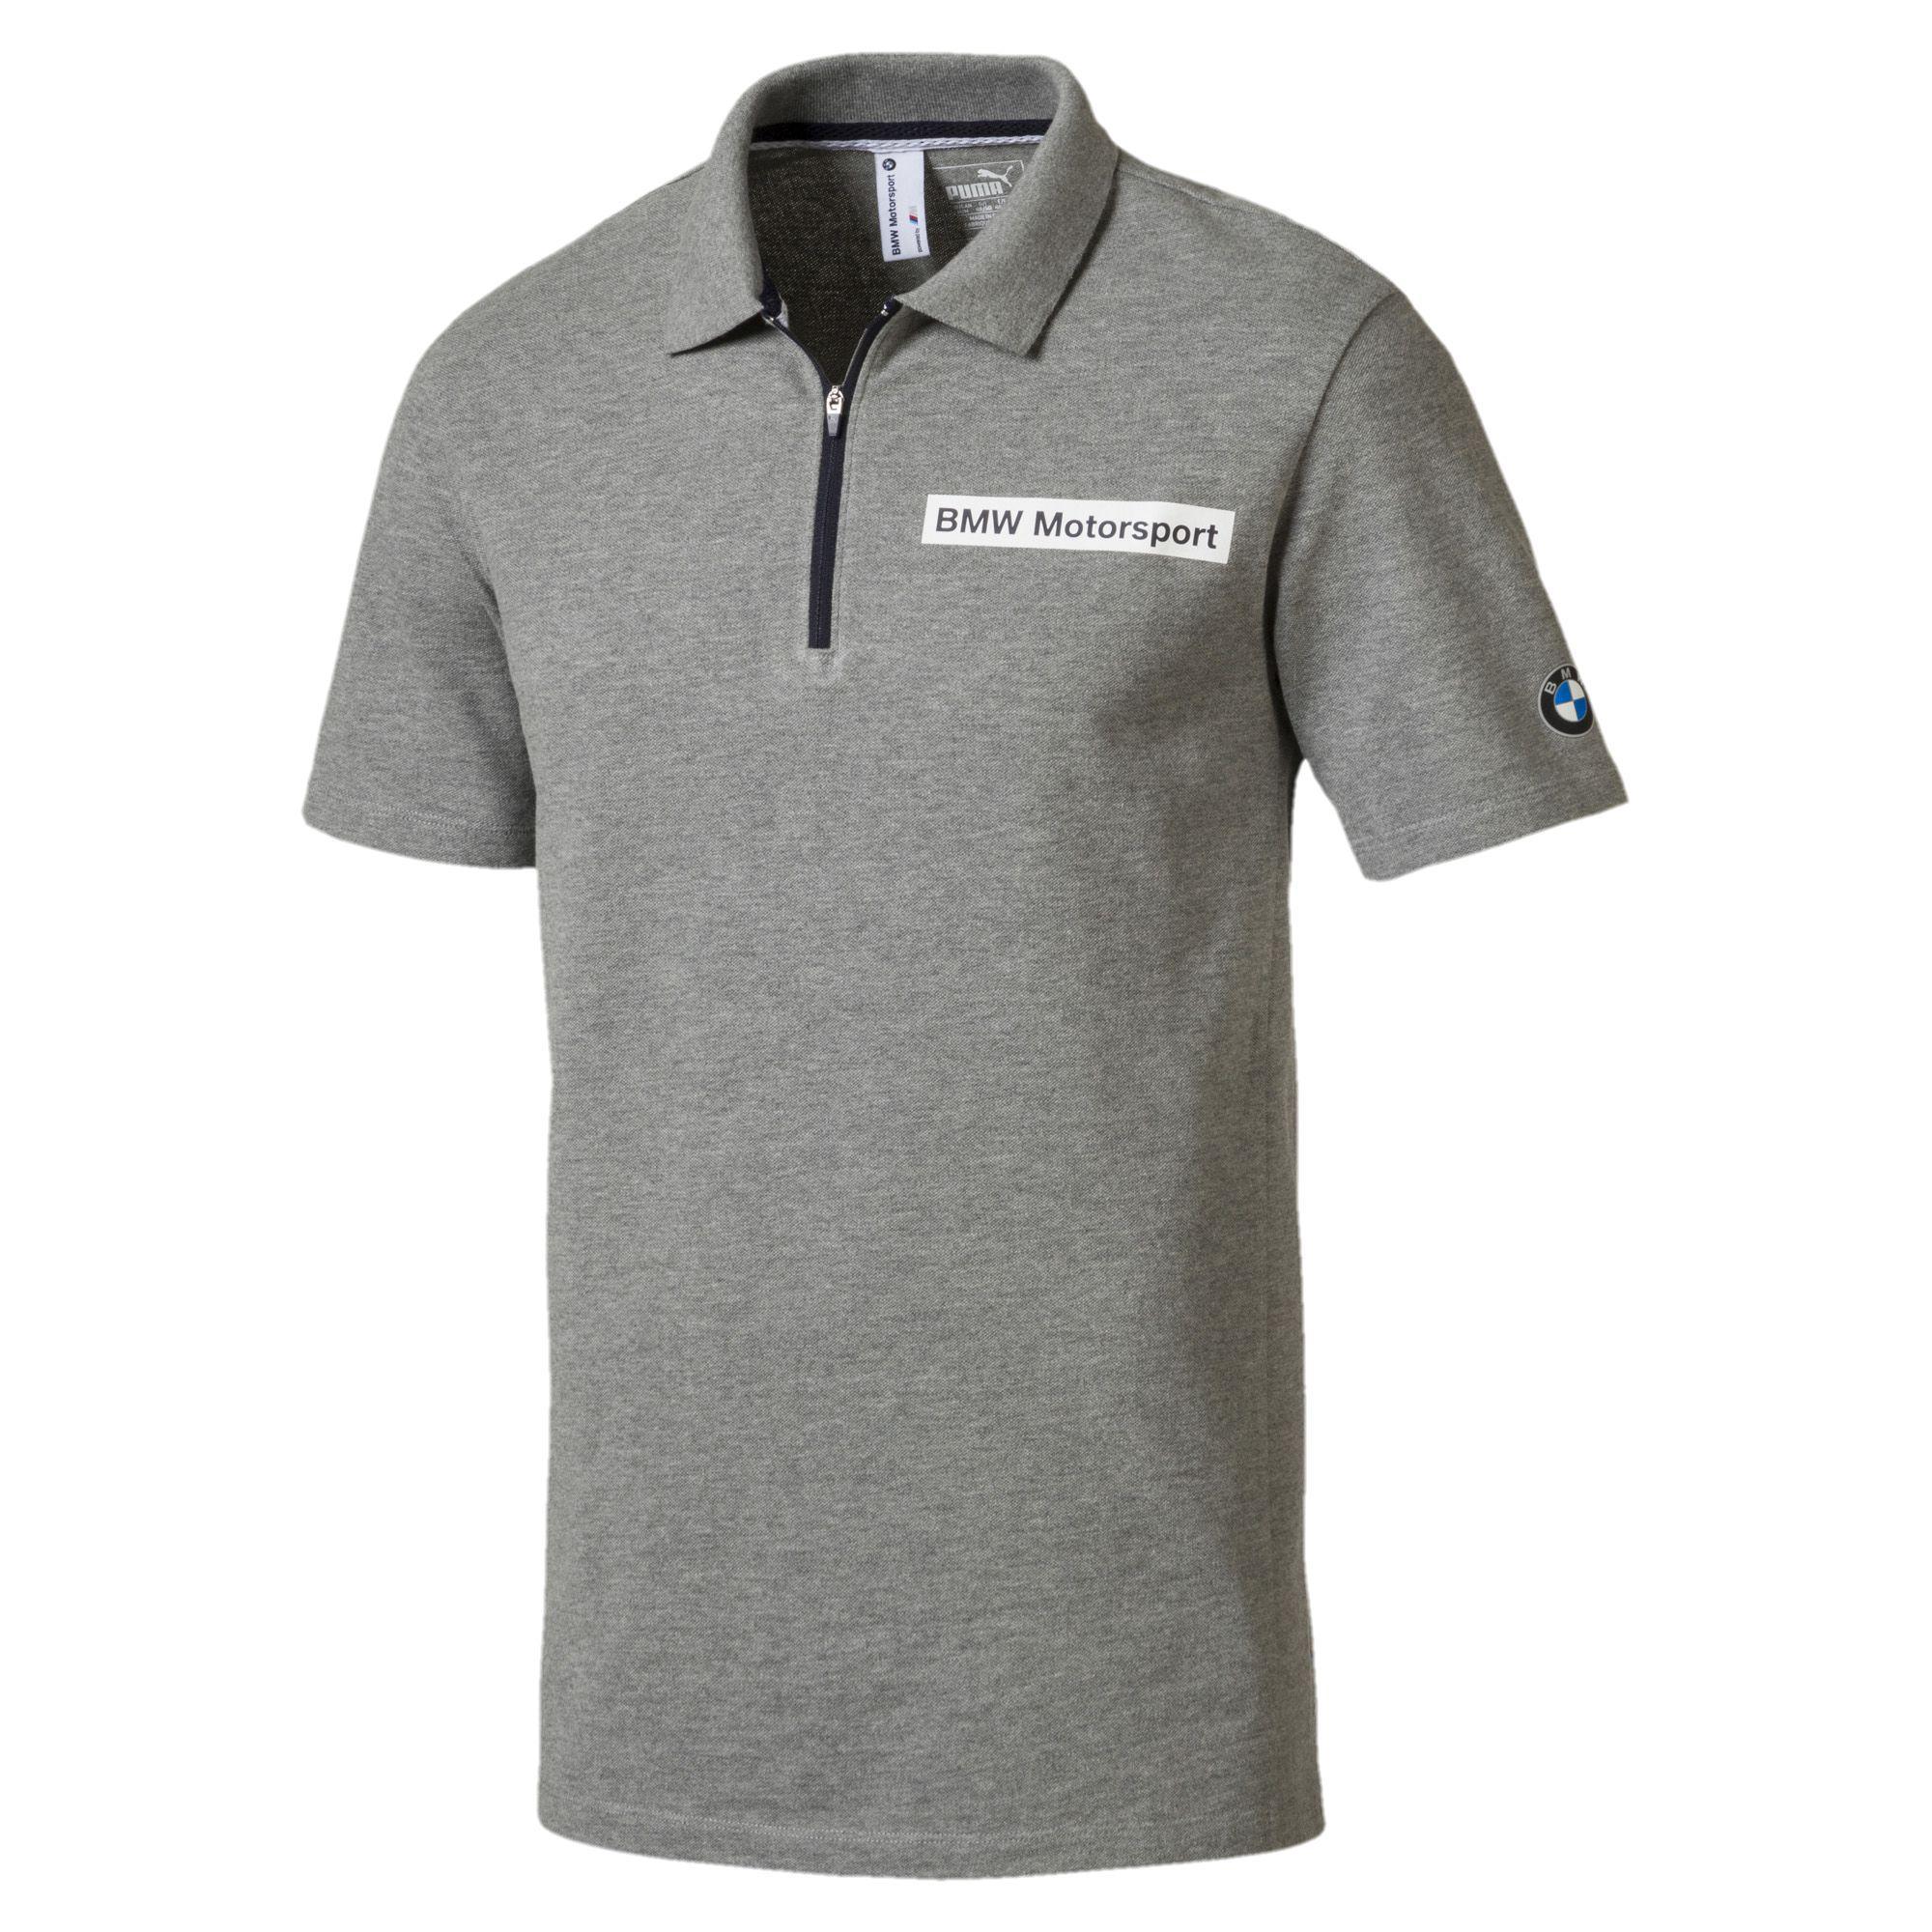 PUMA. Gray Bmw Motorsport Men's Polo Shirt